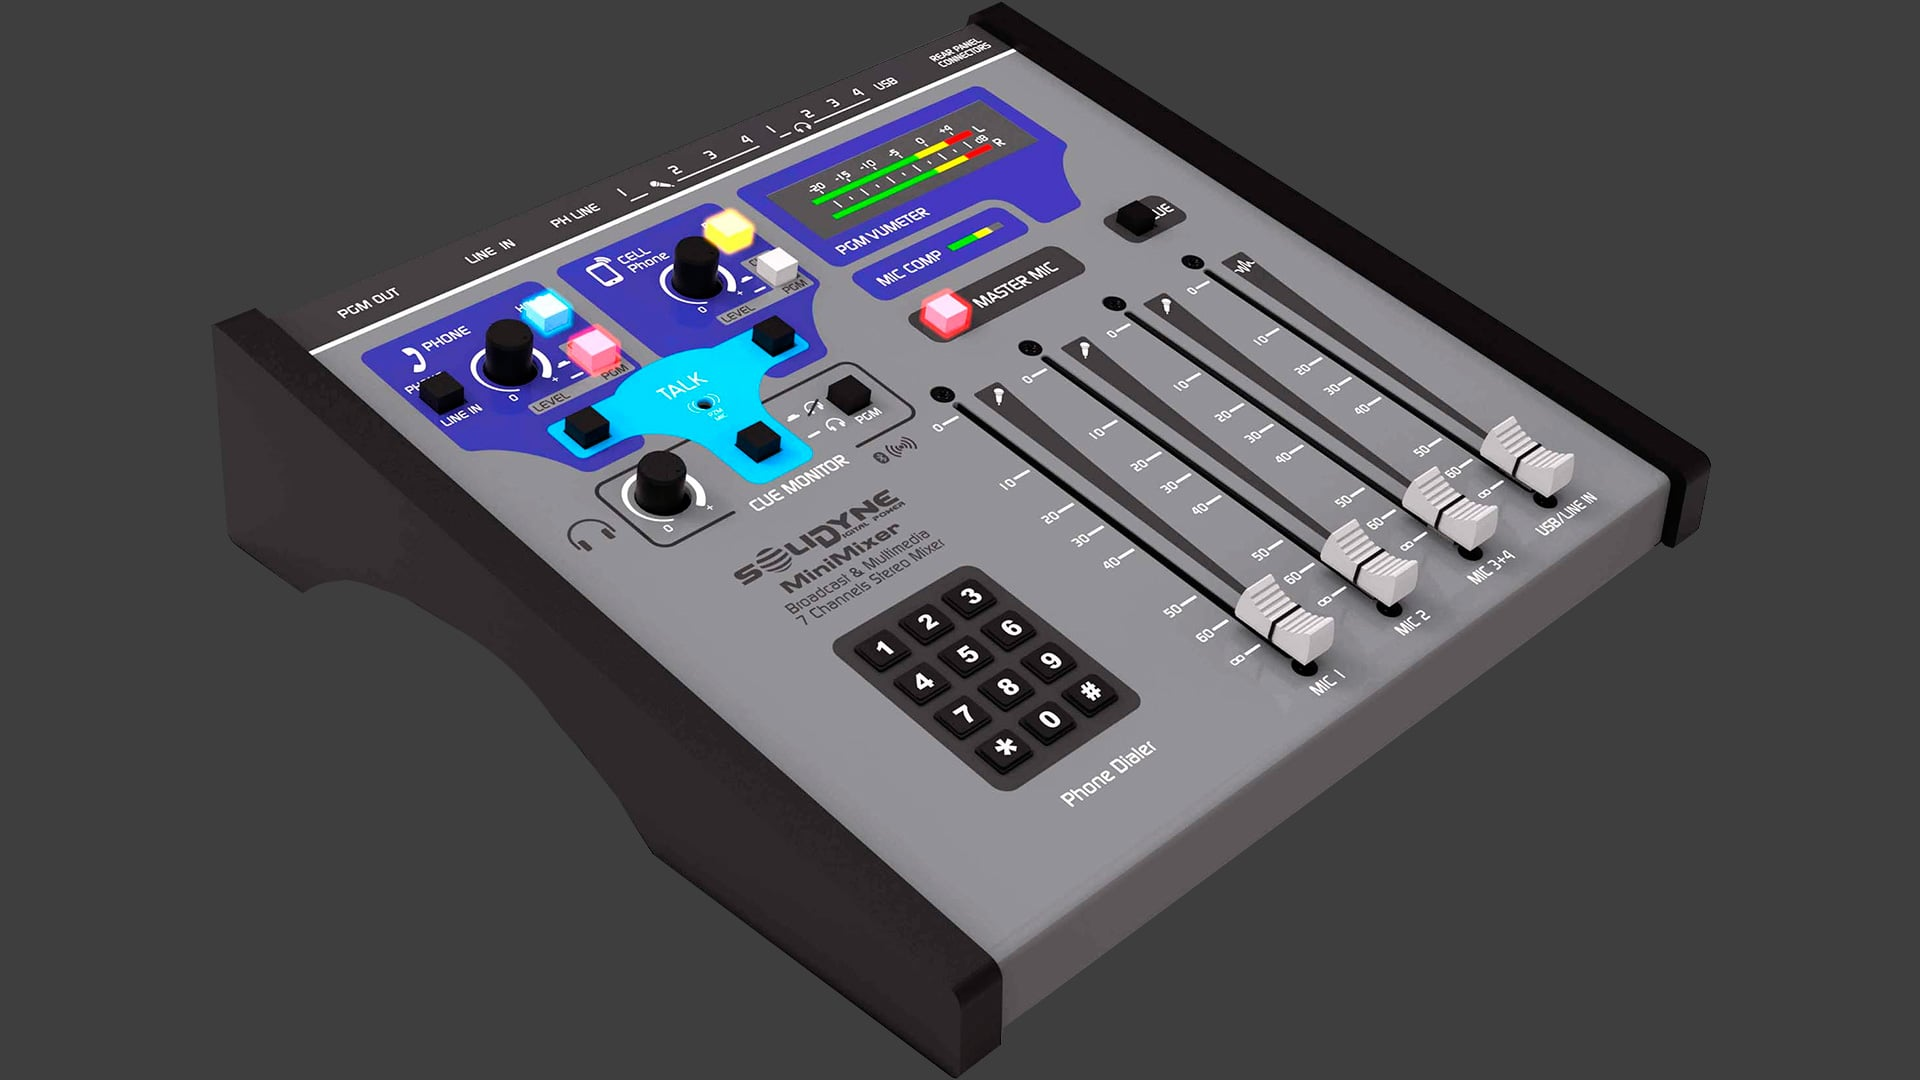 Minimixer-Audicom-MX-Solidyne-Television-Radio-Emisoras-FM-AM-Internet-Virtual-Online-Buena-Imagen-Bogotá-Colombia